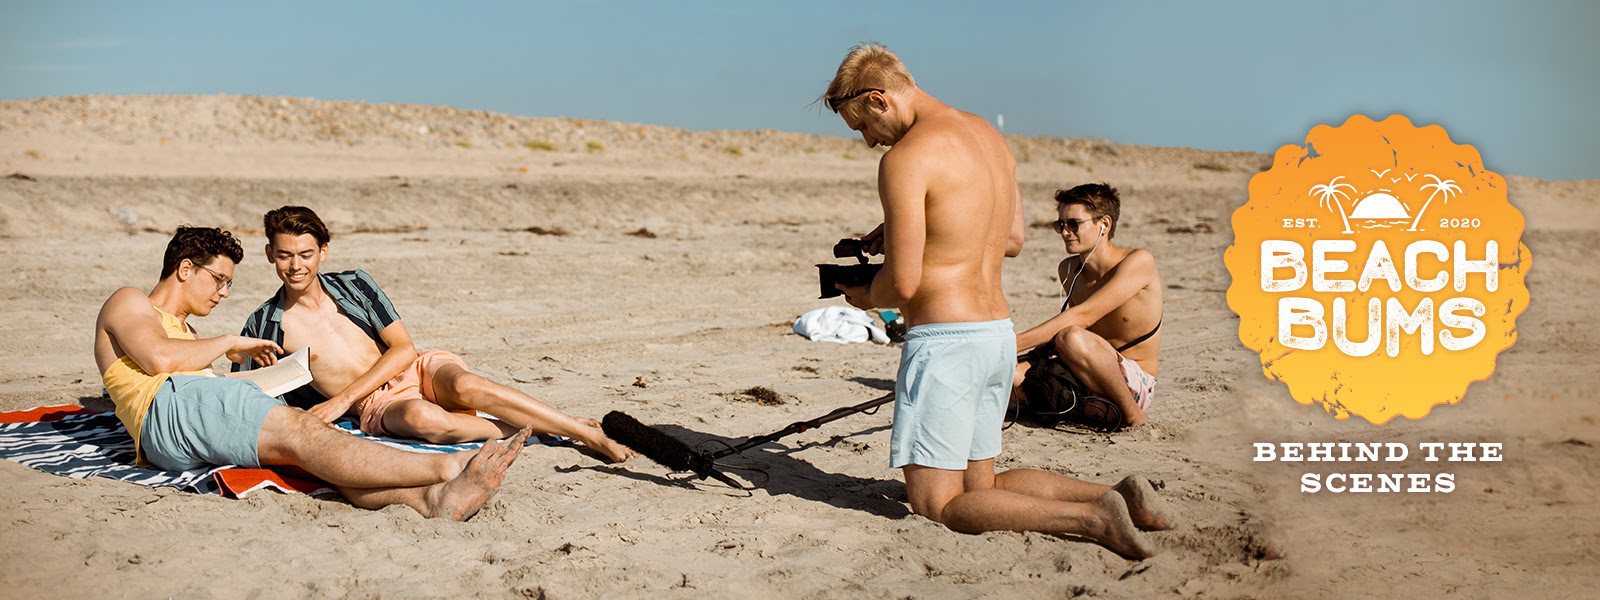 Beach Bums   Behind the Scenes